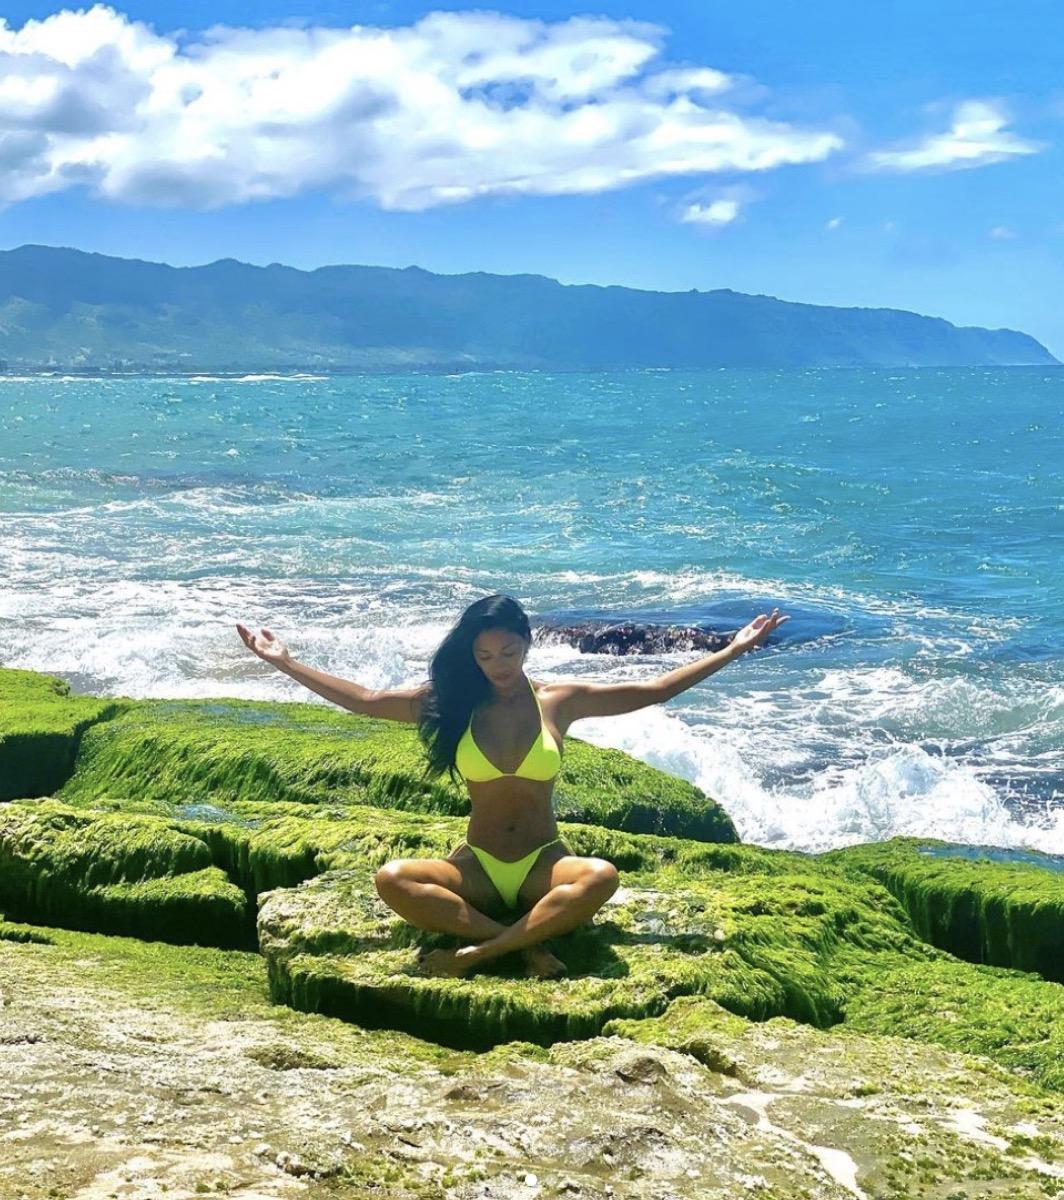 nicole scherzinger stretching in green bikini on beach